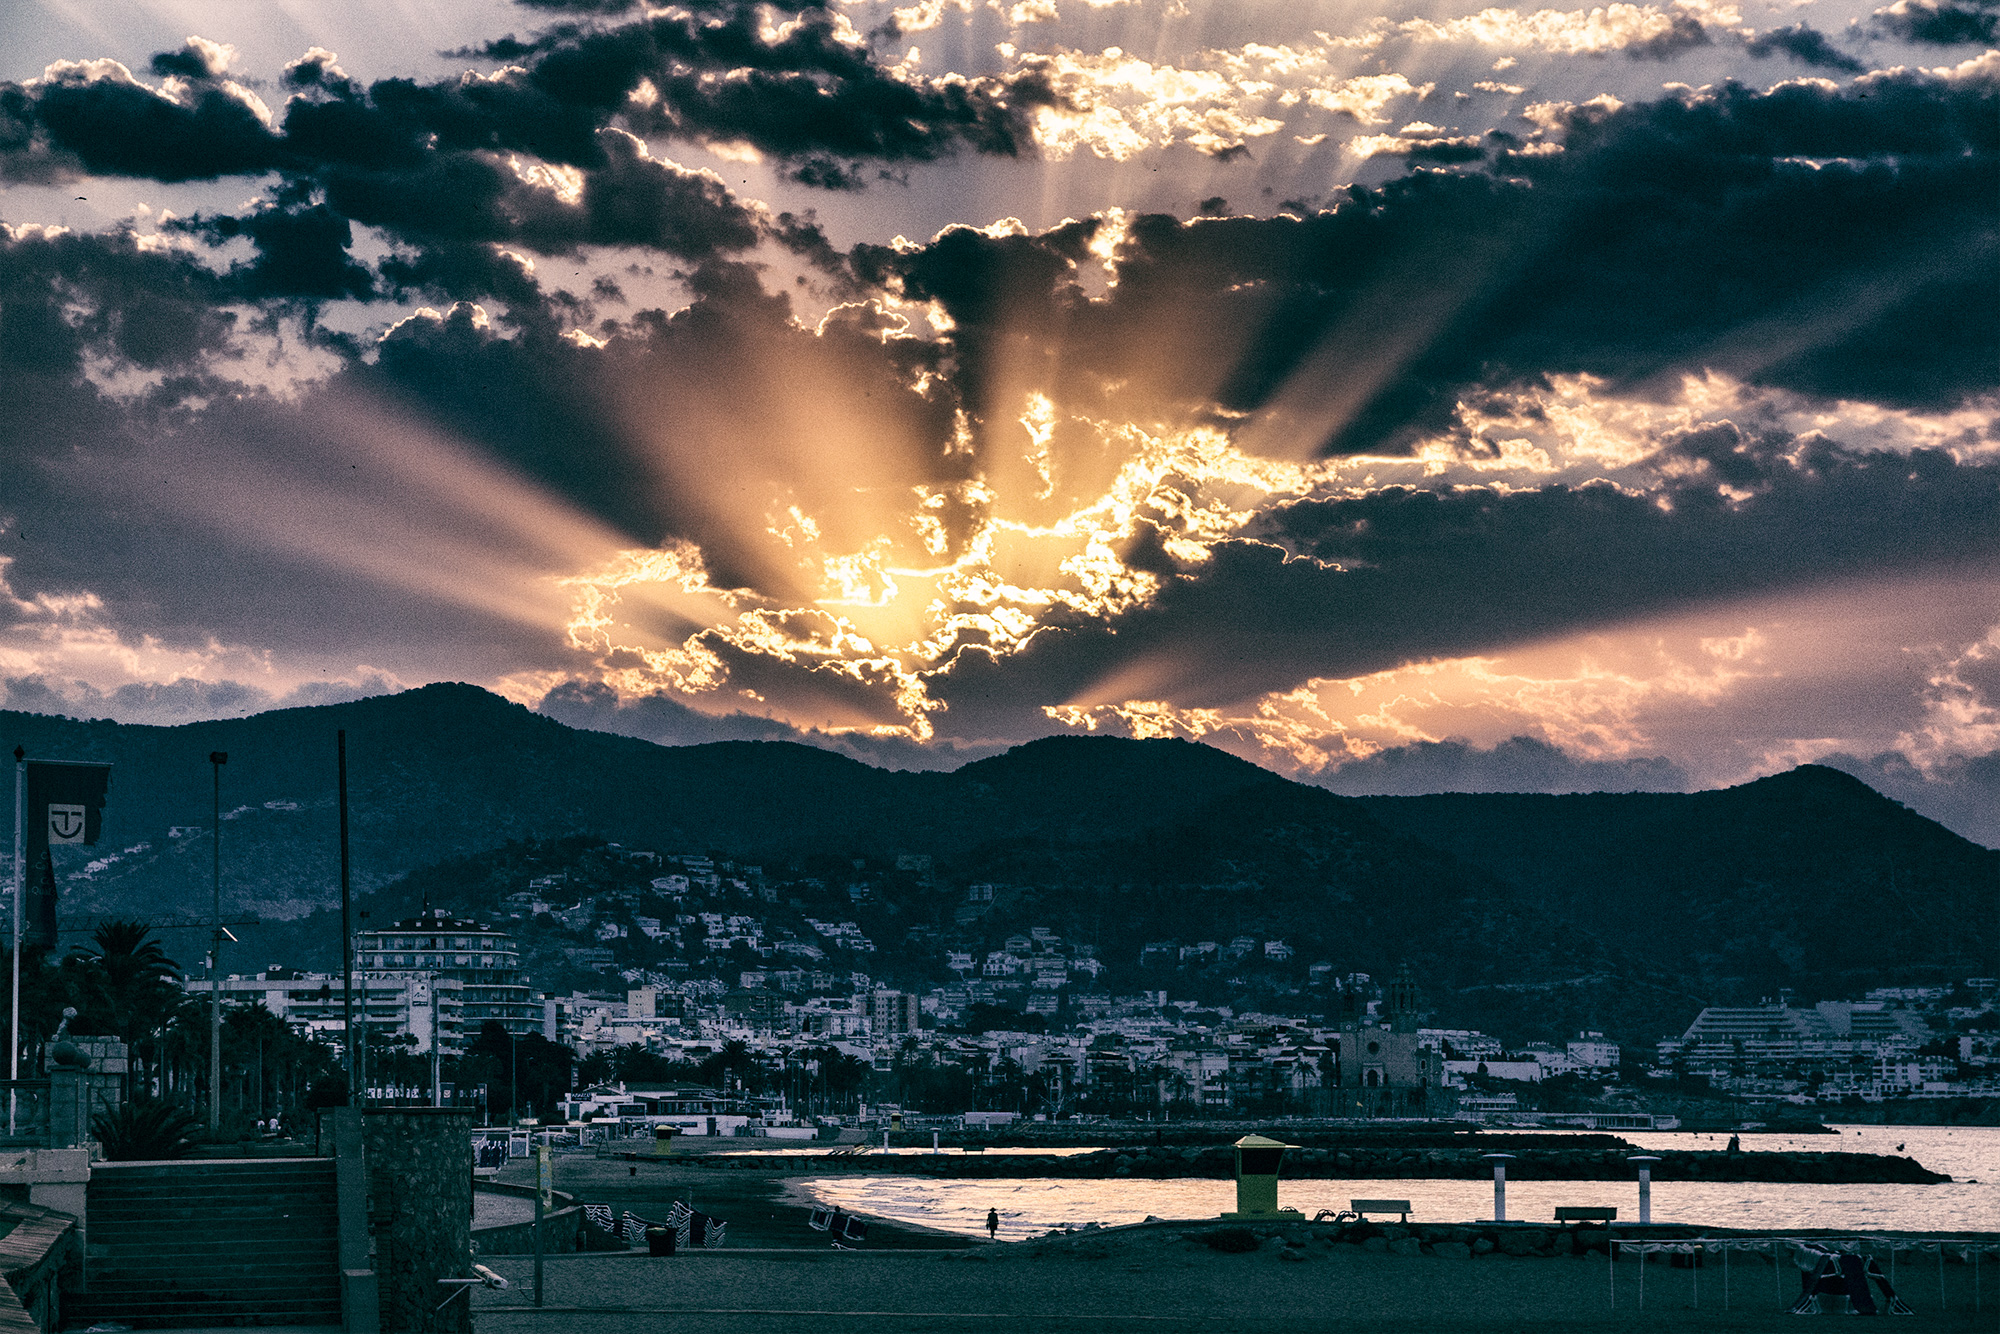 Sonnenaufgang in Sitges, Spanien. Die Sonne glüht.